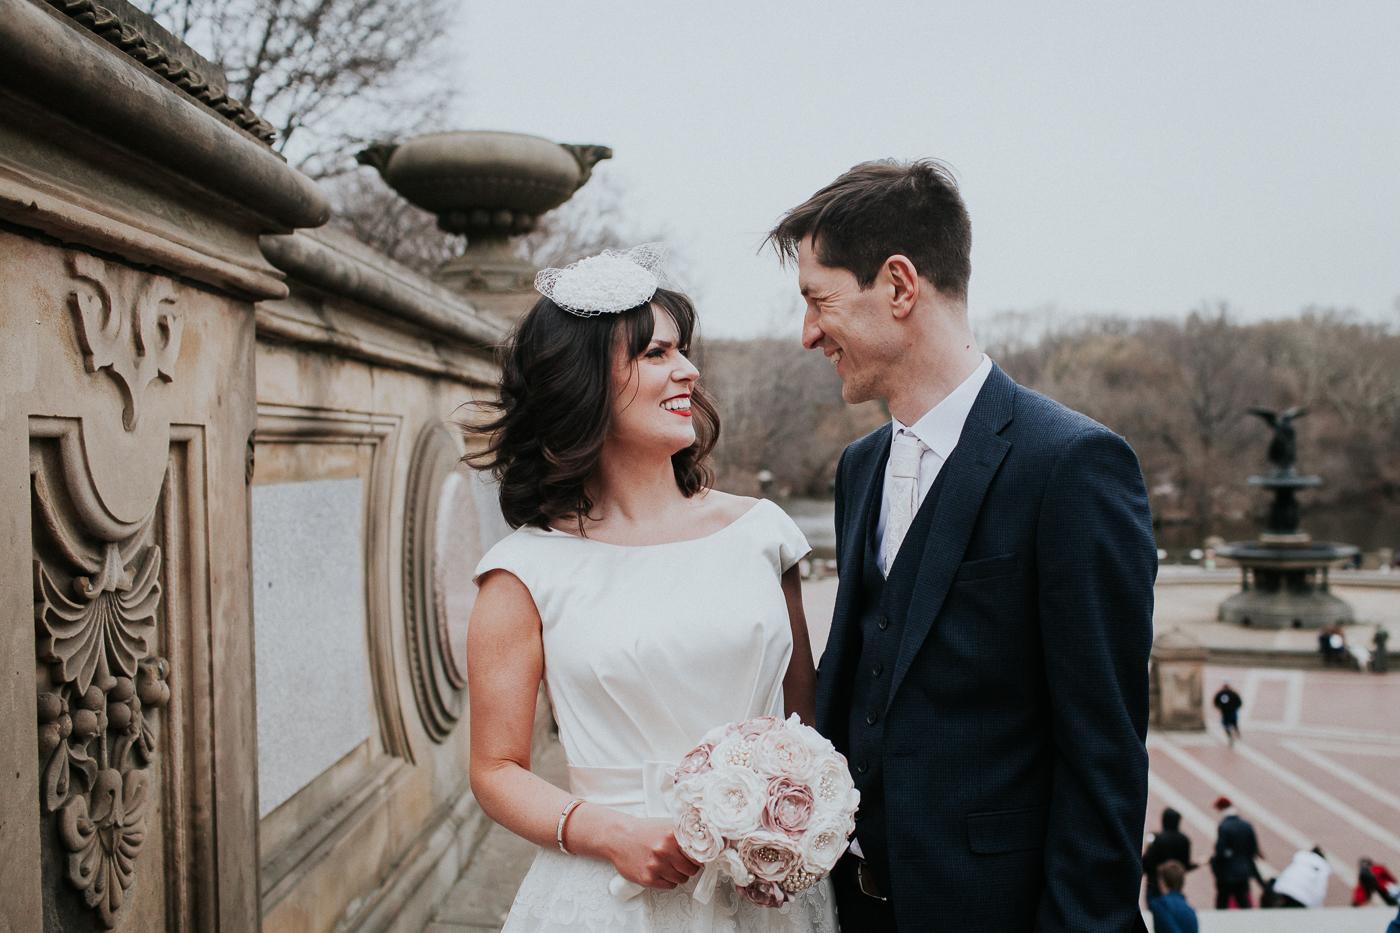 Ladies-Pavilion-Central-Park-NYC-Documentary-Elopement-Wedding-Photographer-62.jpg